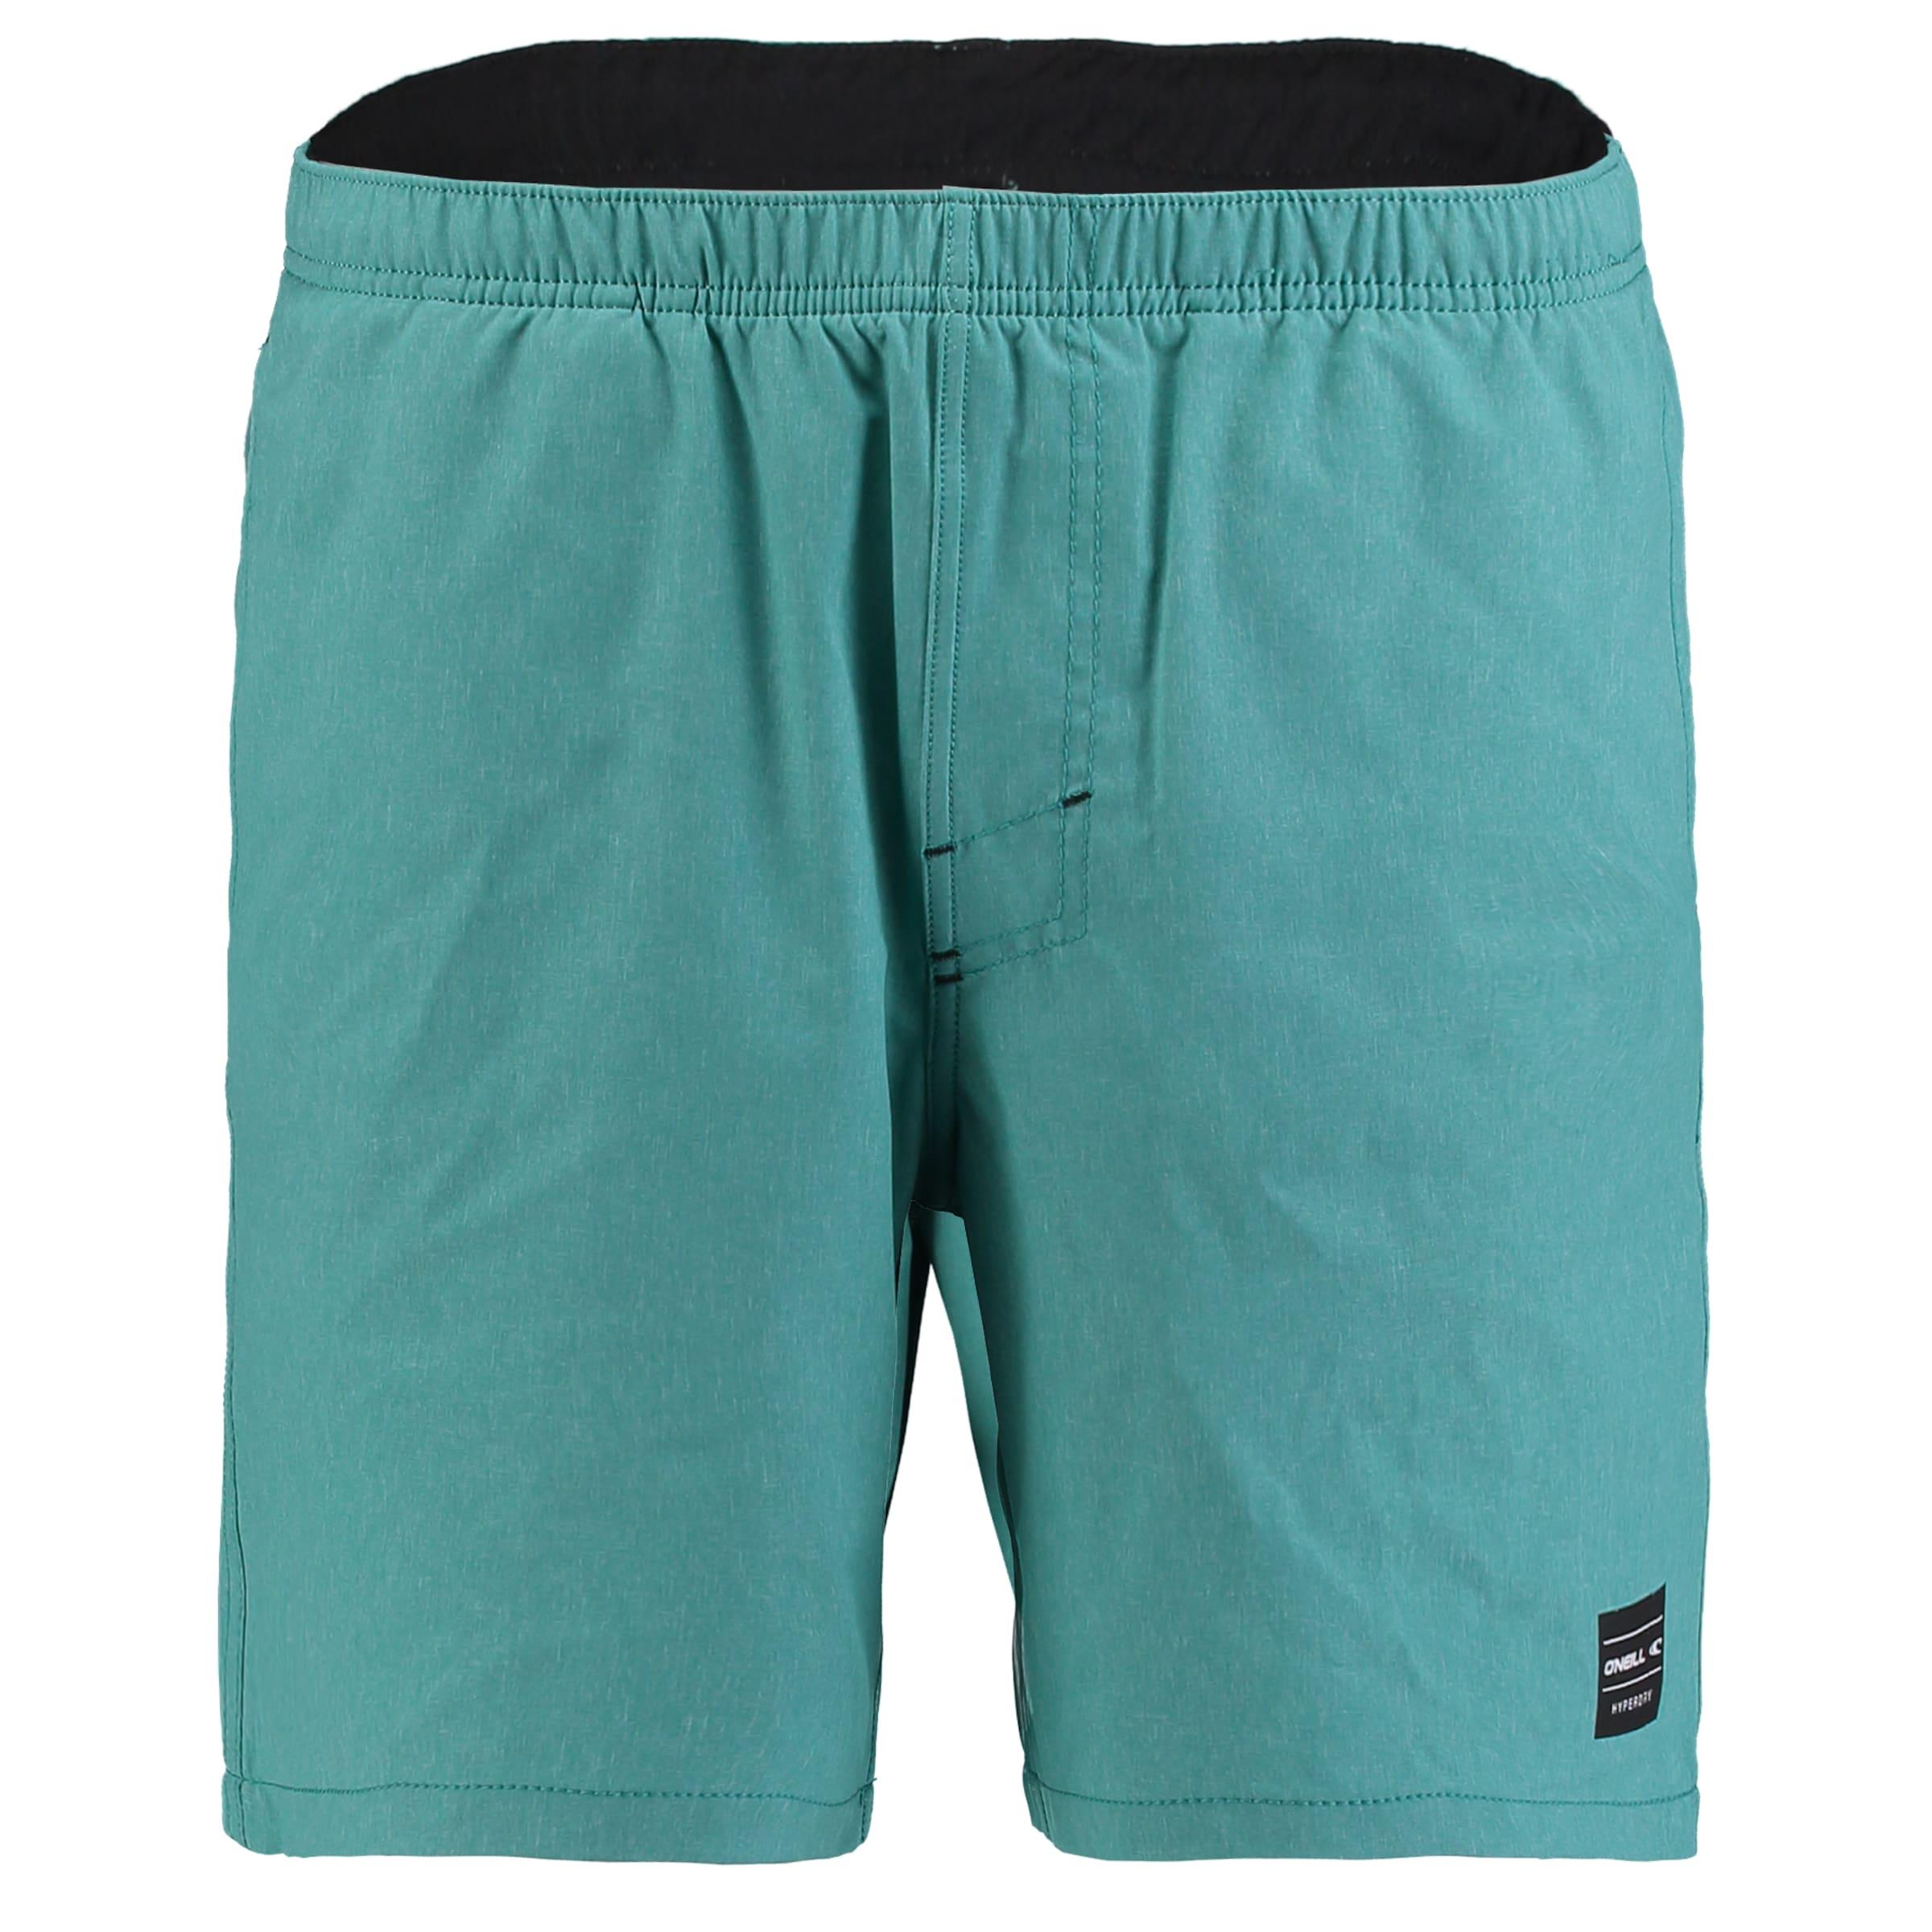 O'NEILL Shorts 'PM All Day Hybrid' Verkauf Geschäft Online 100% Garantiert Billig 100% Garantiert Marktfähig oBZHeHarg2